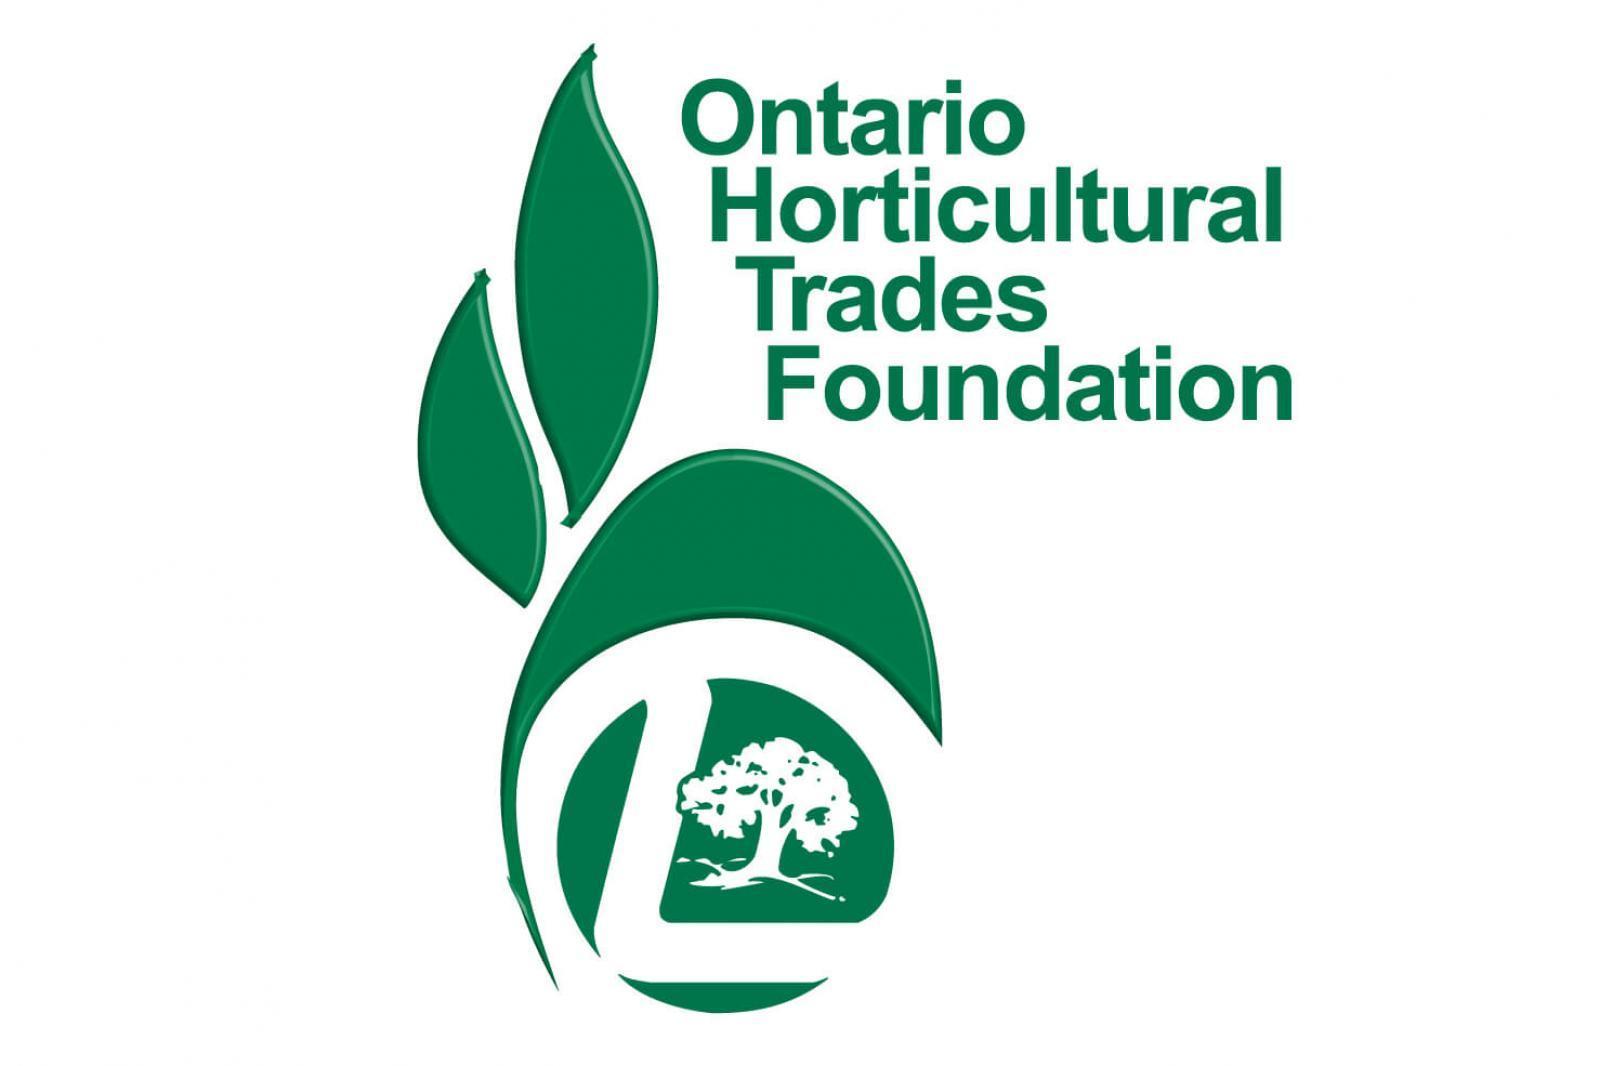 Foundation Landscape Ontario